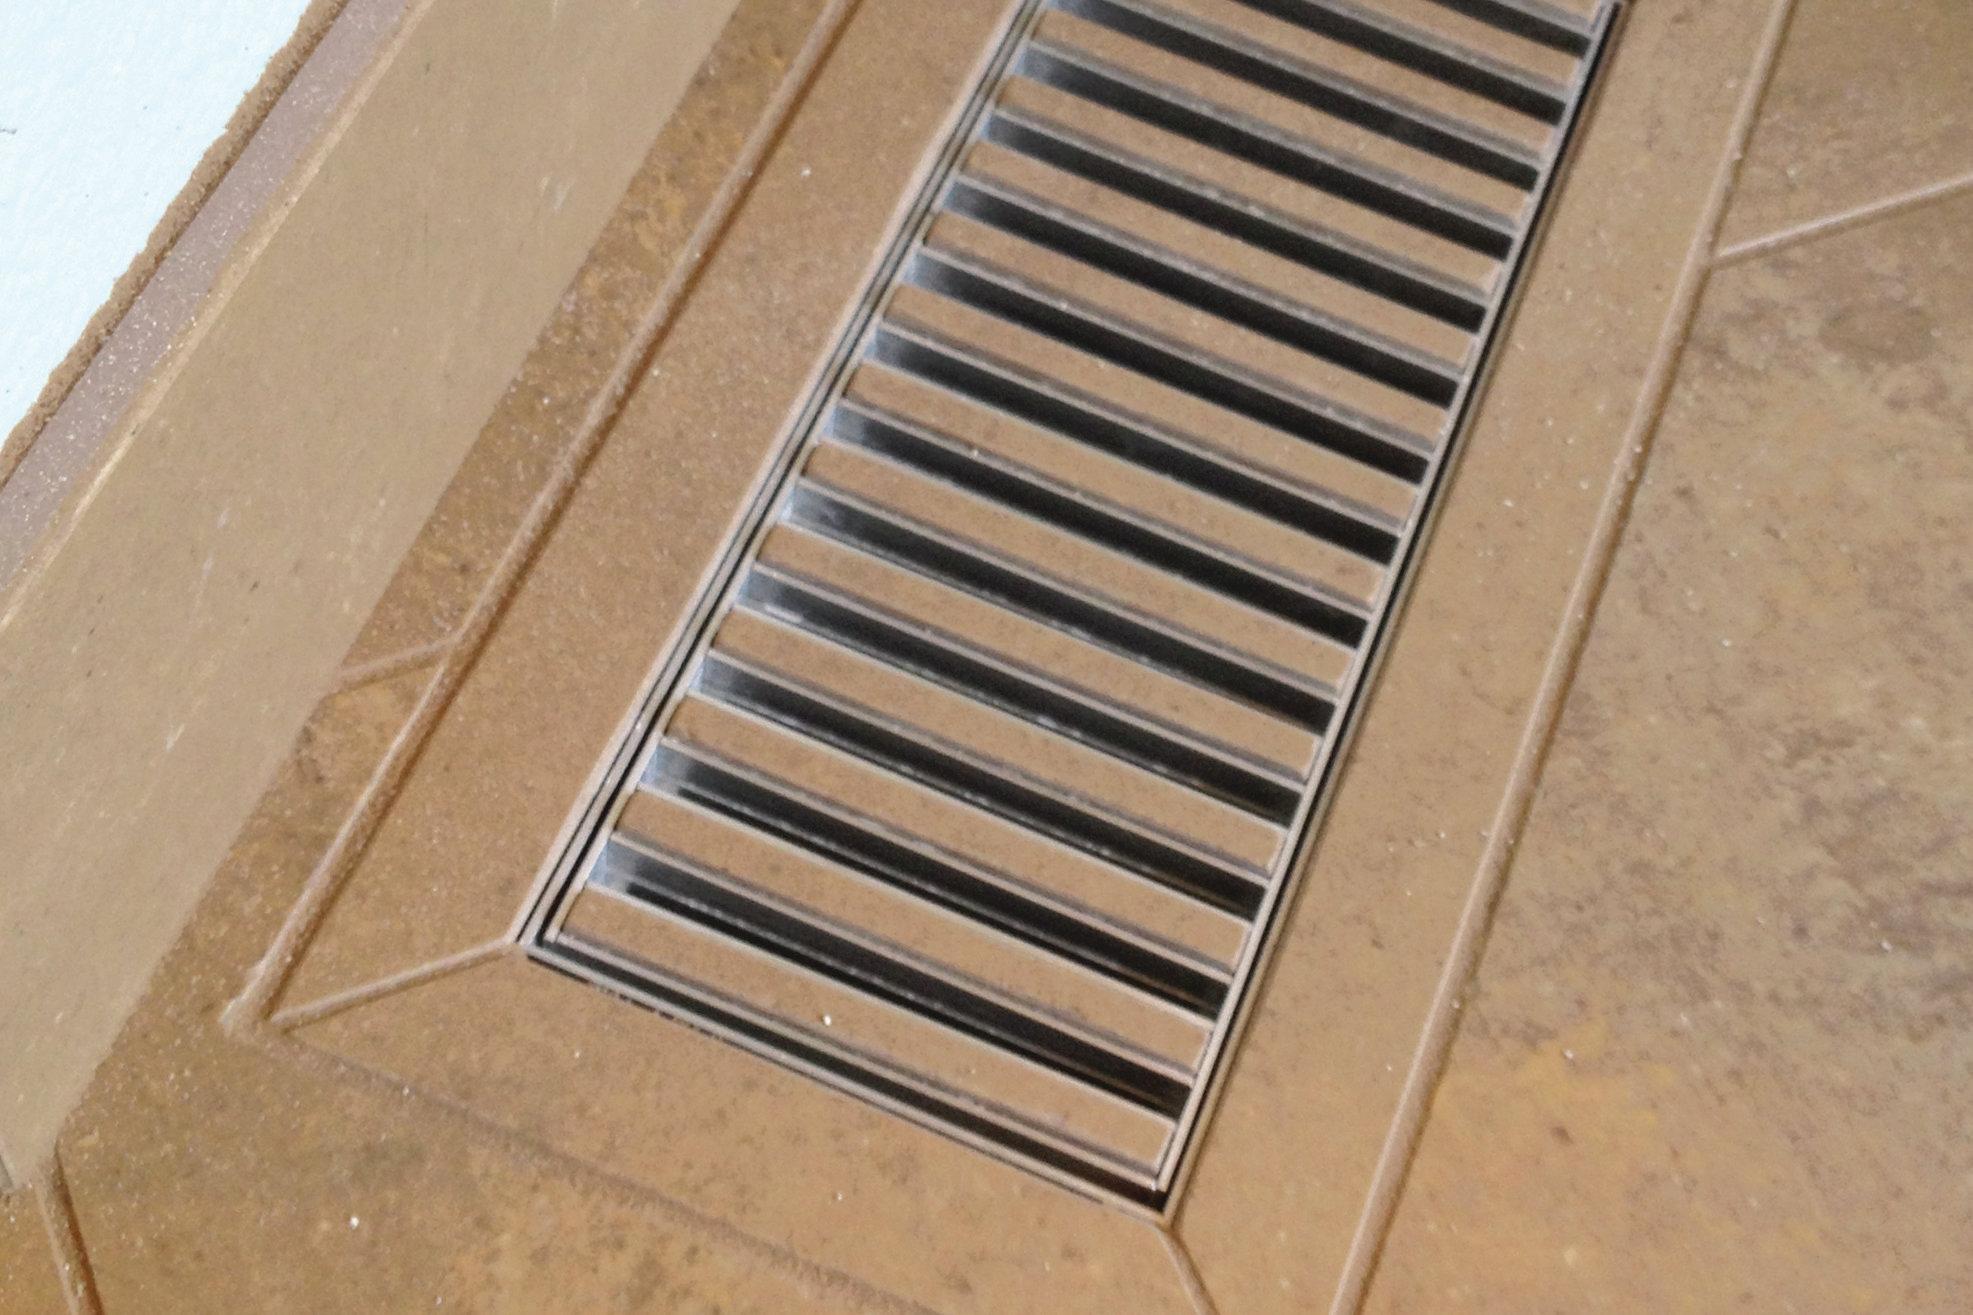 Veiled Vent | Remodeling | Flooring, Seattle Tacoma Bellevue, WA, Nina Patel